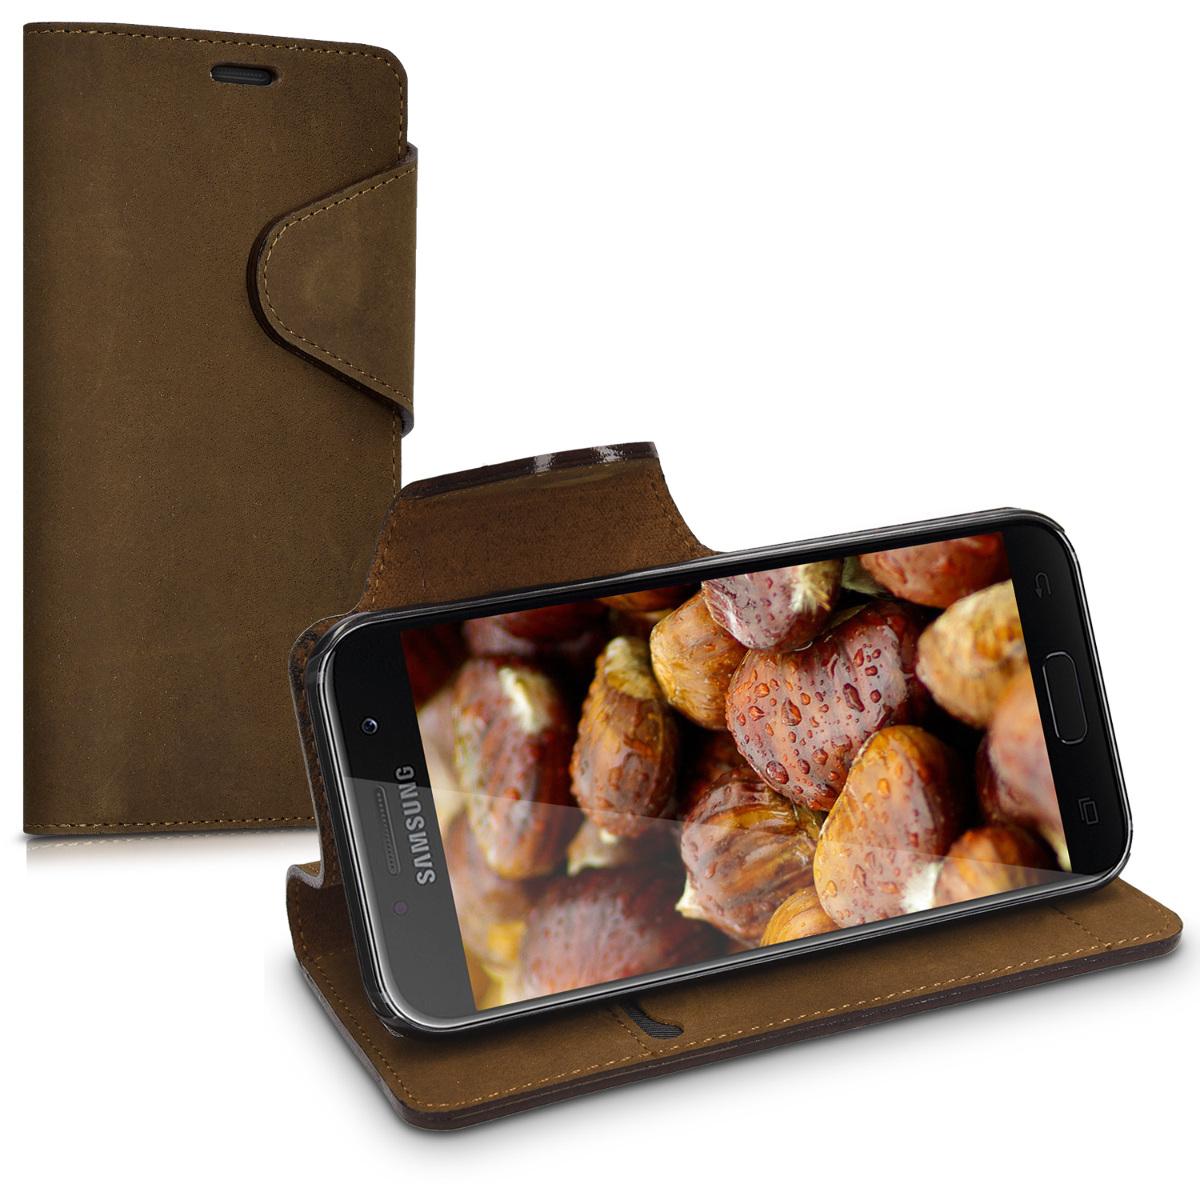 Kalibri Δερμάτινη Suede Θήκη - Πορτοφόλι  Samsung Galaxy A3 (2017) - Brown (40767.05)